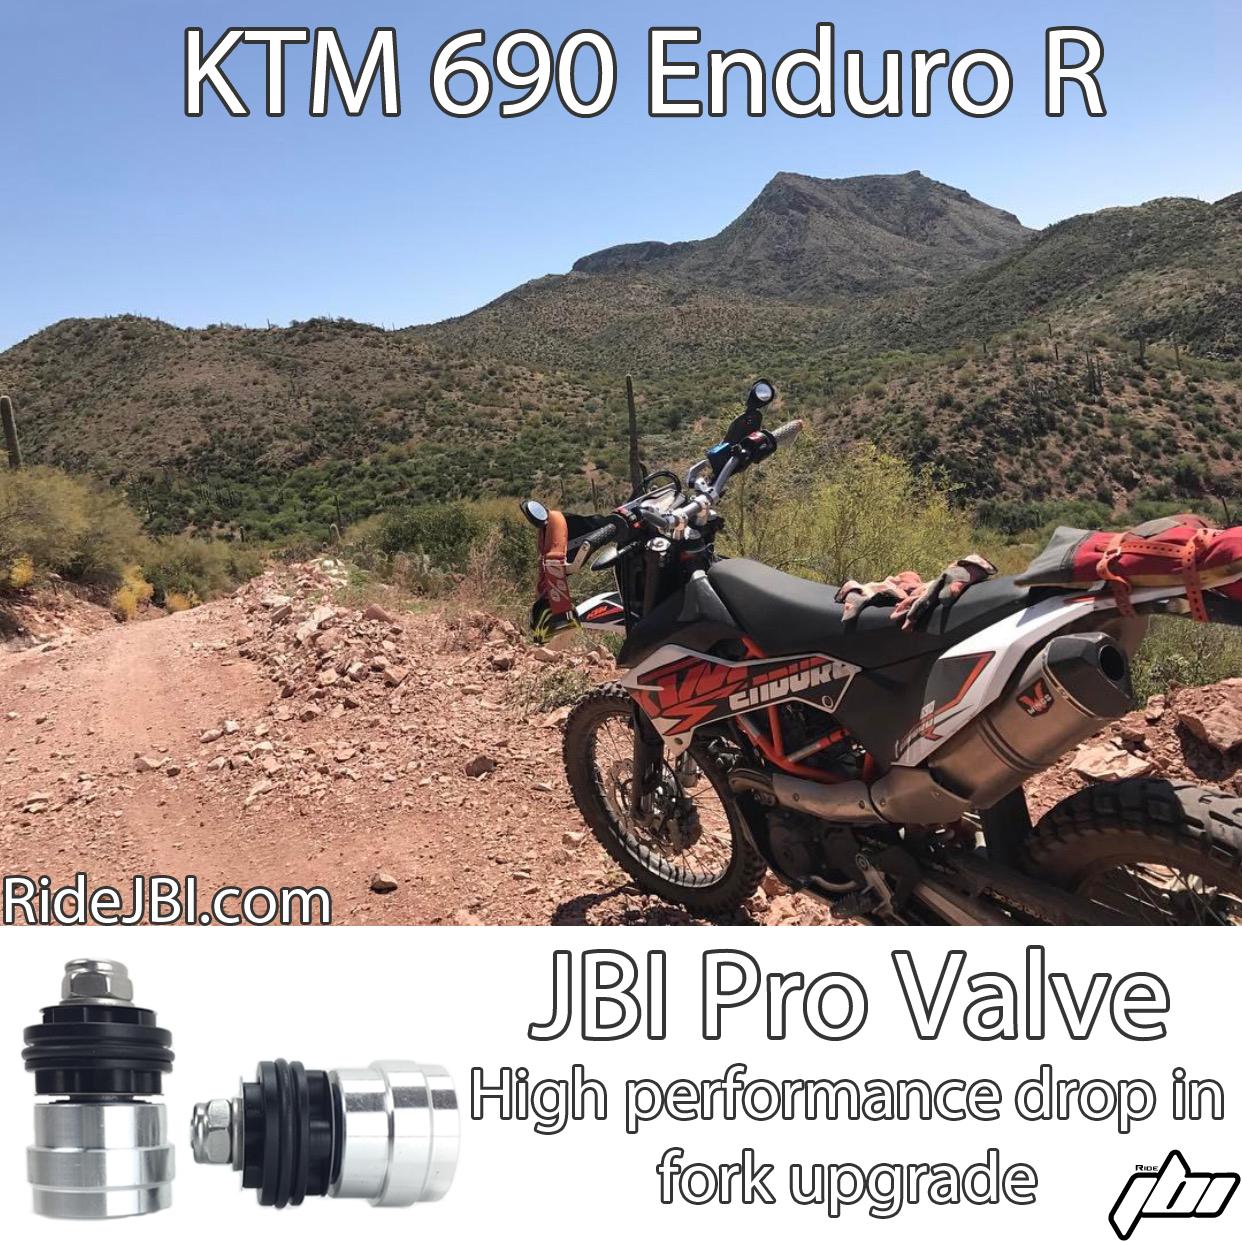 KTM 690 Enduro R JBI Suspension Pro Valve